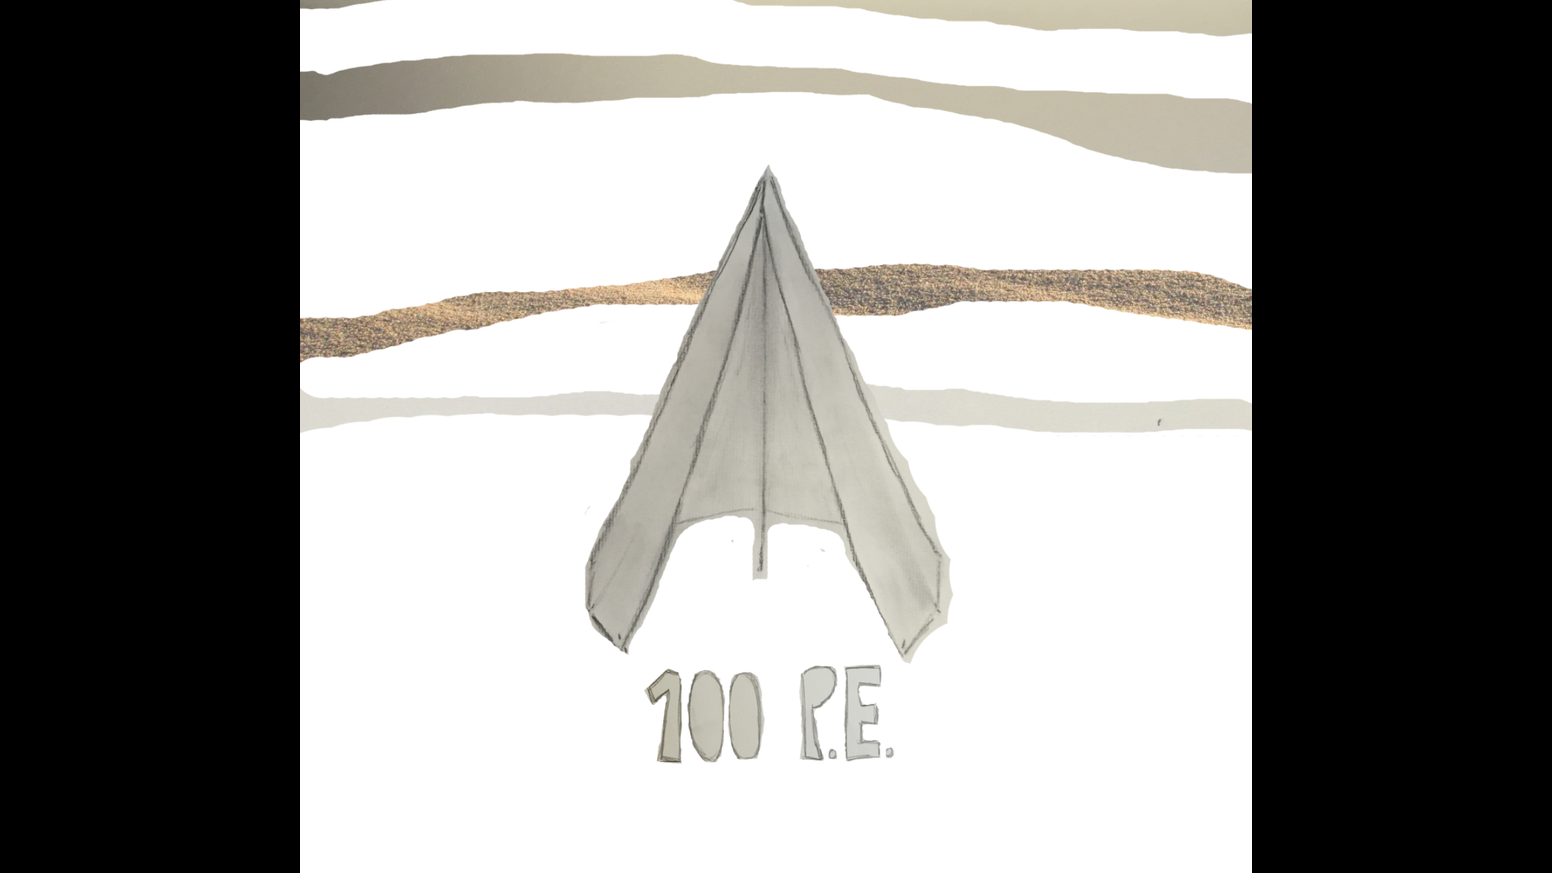 p e by zachary brenner and noa kattler kupetz kickstarter 100 p e